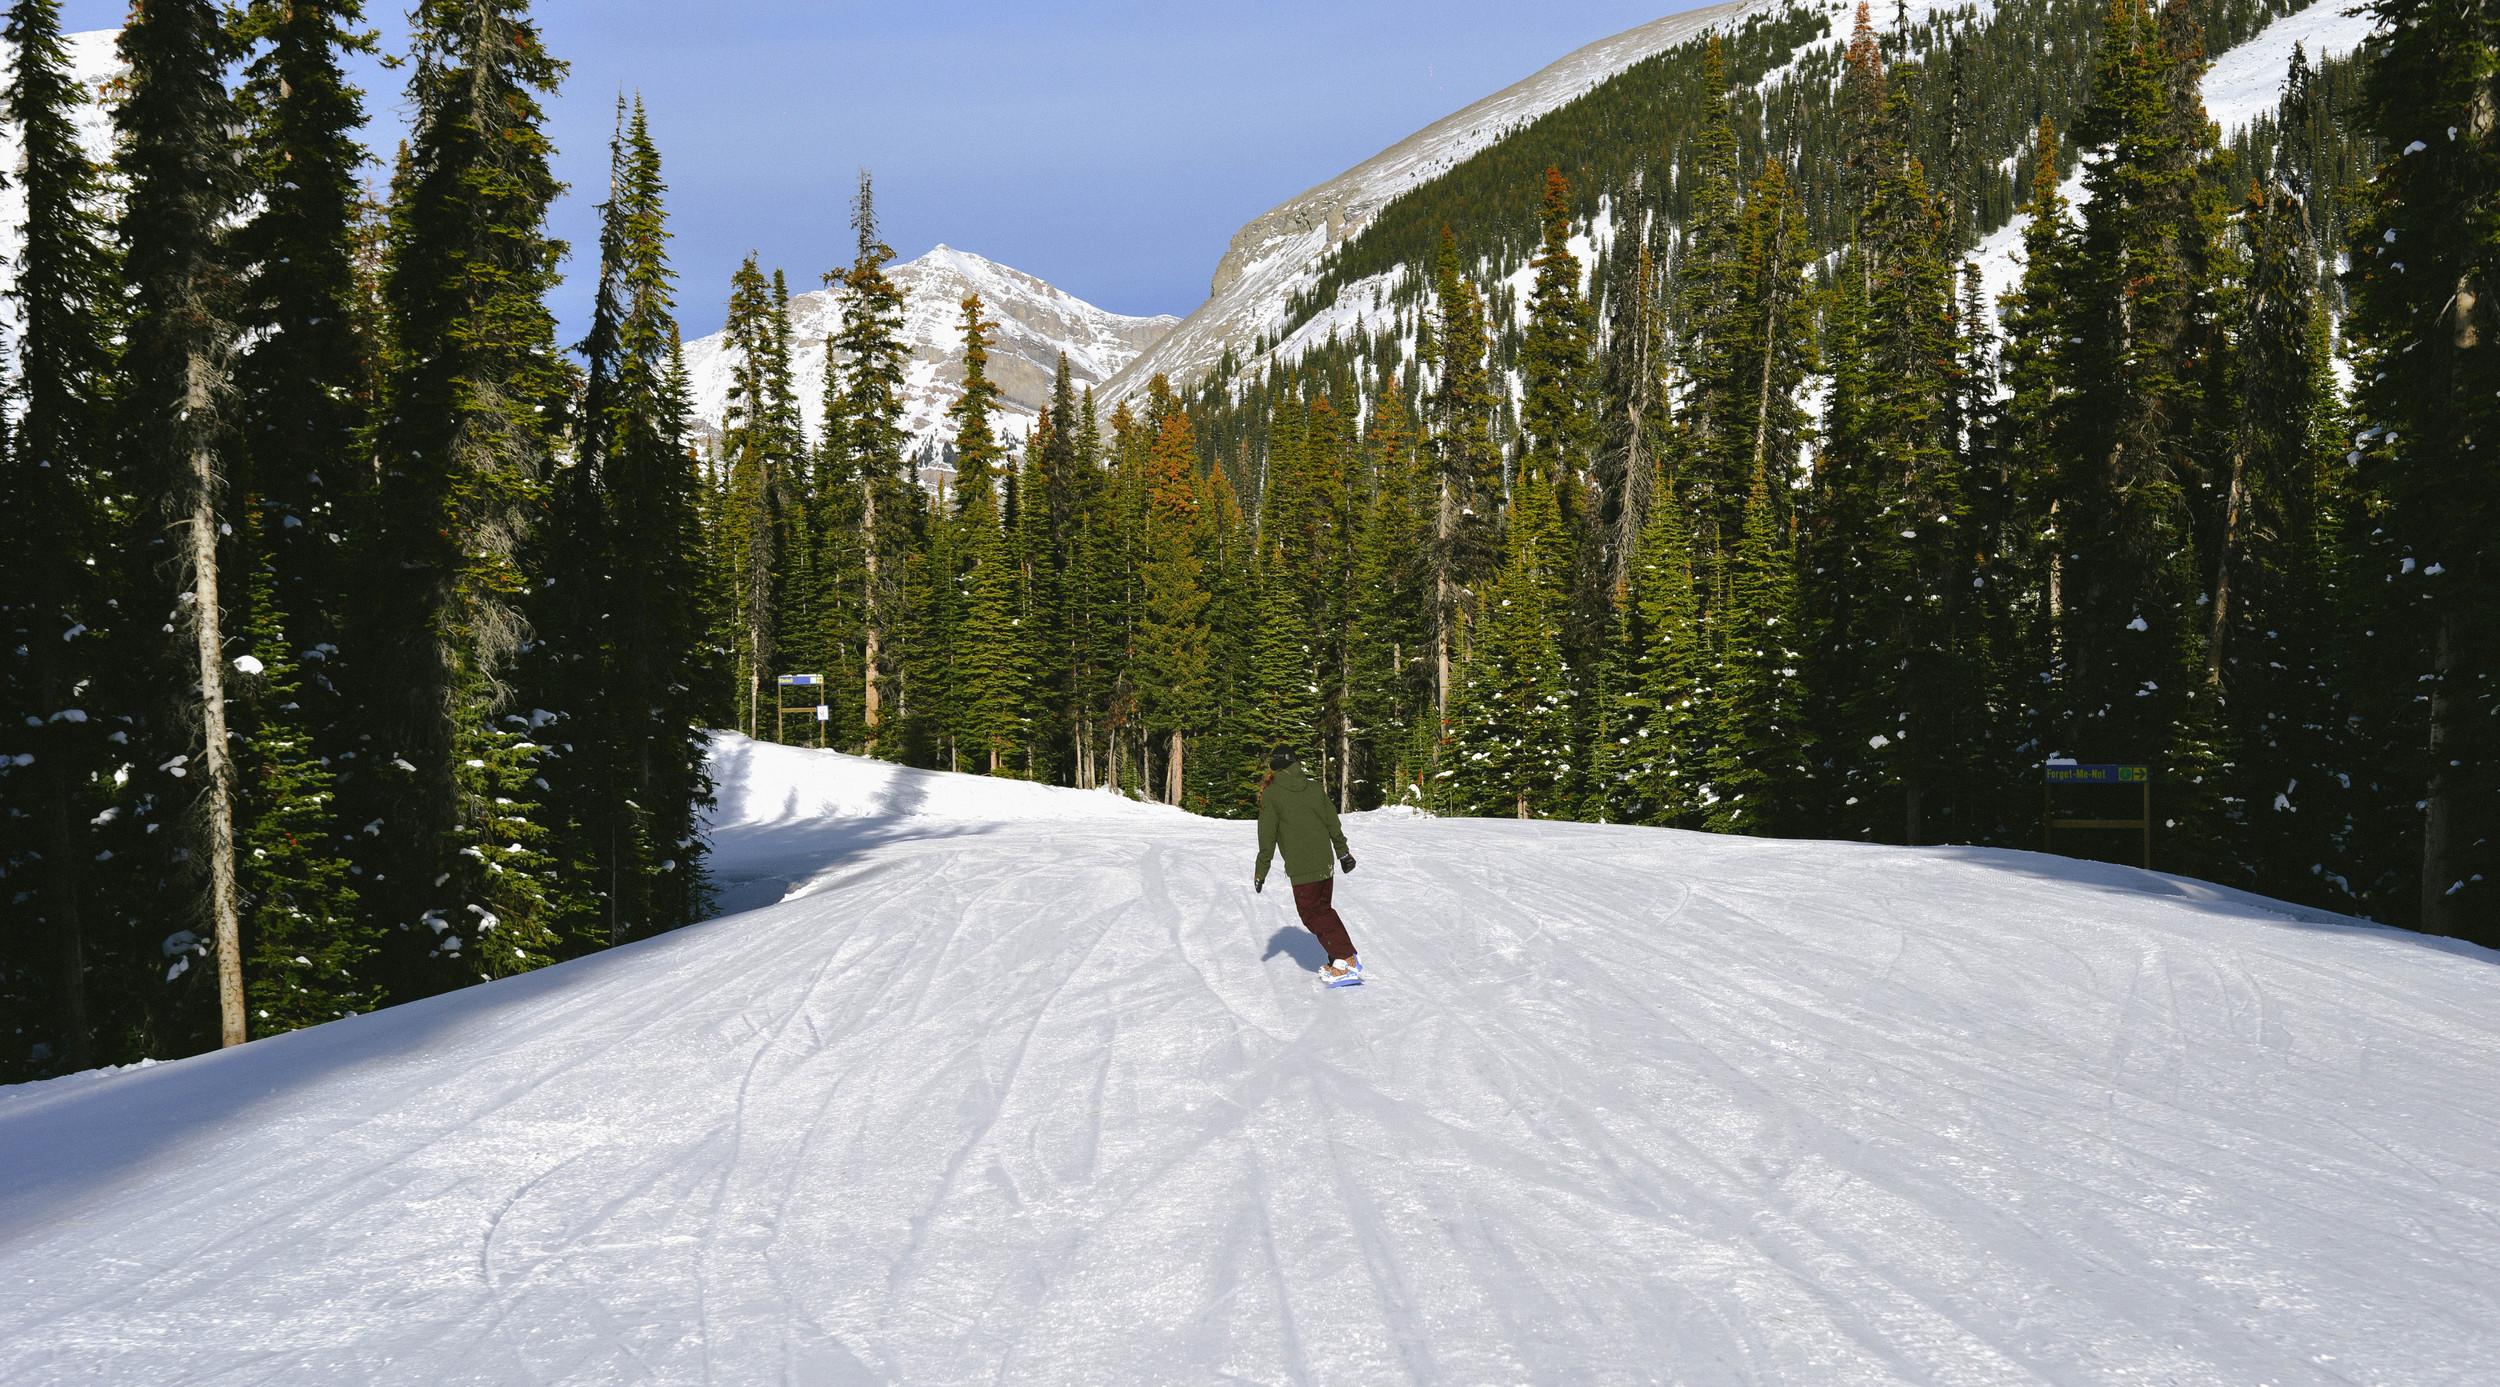 Jess snowboarding.